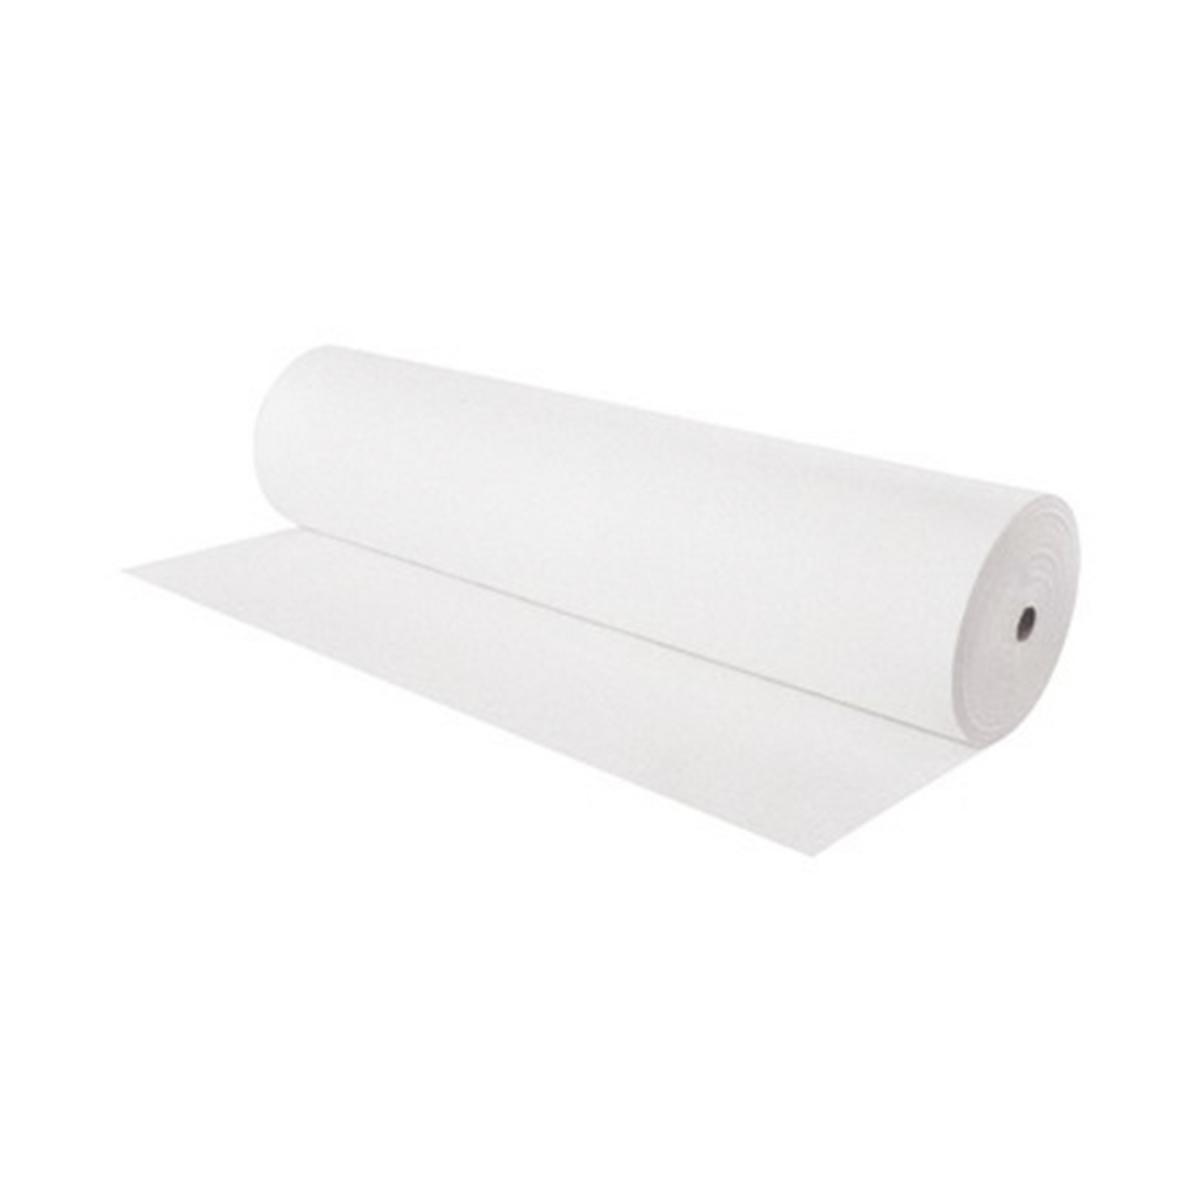 Schwimmbadvlies 400 200 cm, weiß Schwimmbadvlies 400 200 cm, weiß